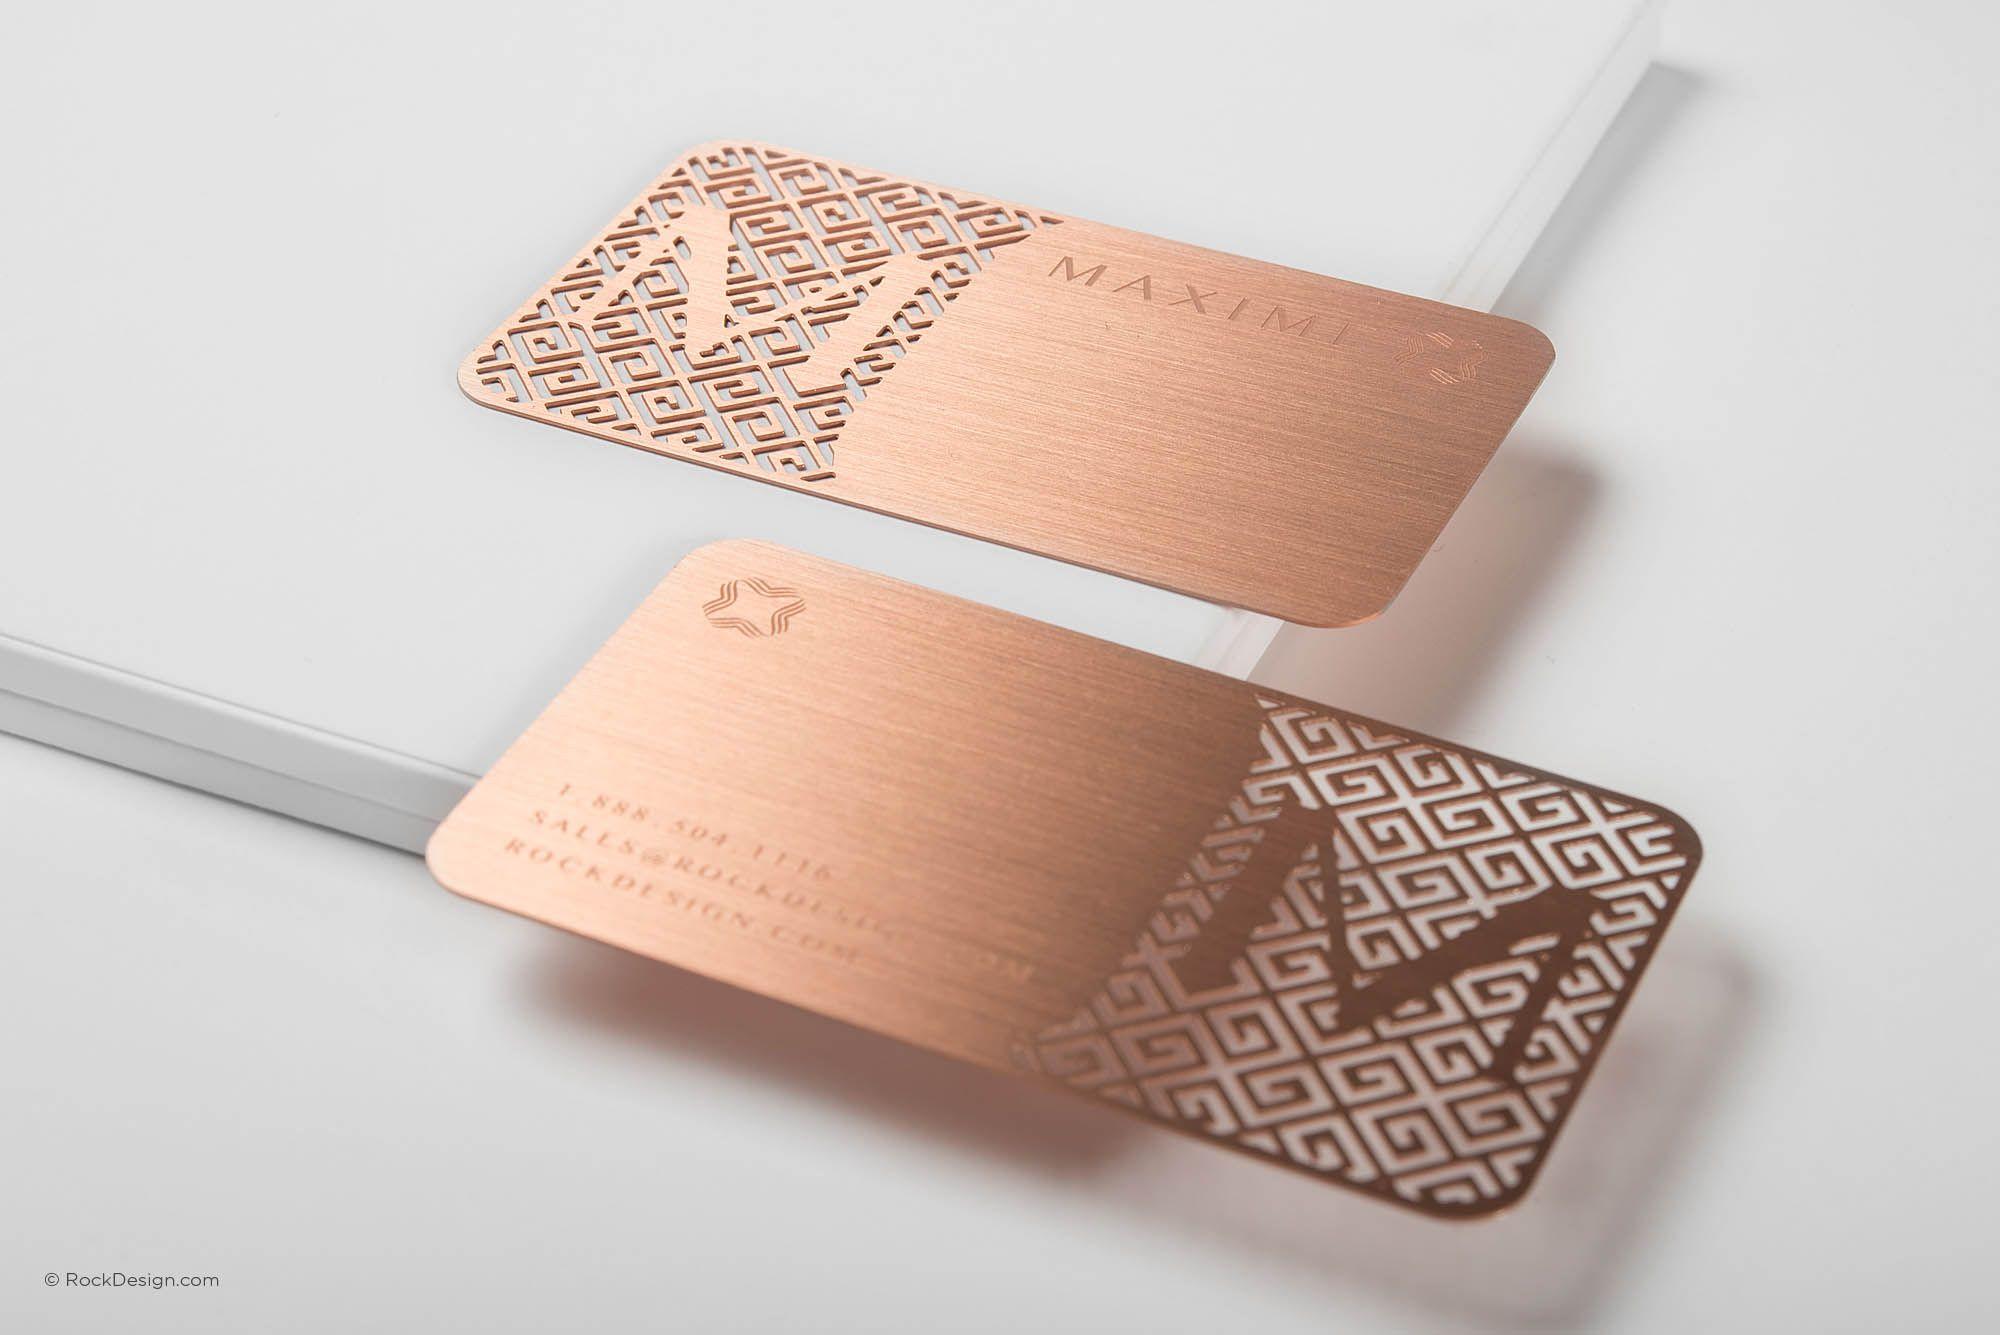 Luxury Rose Gold Metal Business Card With Brush Finishing Maximi Cartoes De Visita Criativos Cartao De Visita Dentista Design De Cartao De Visita